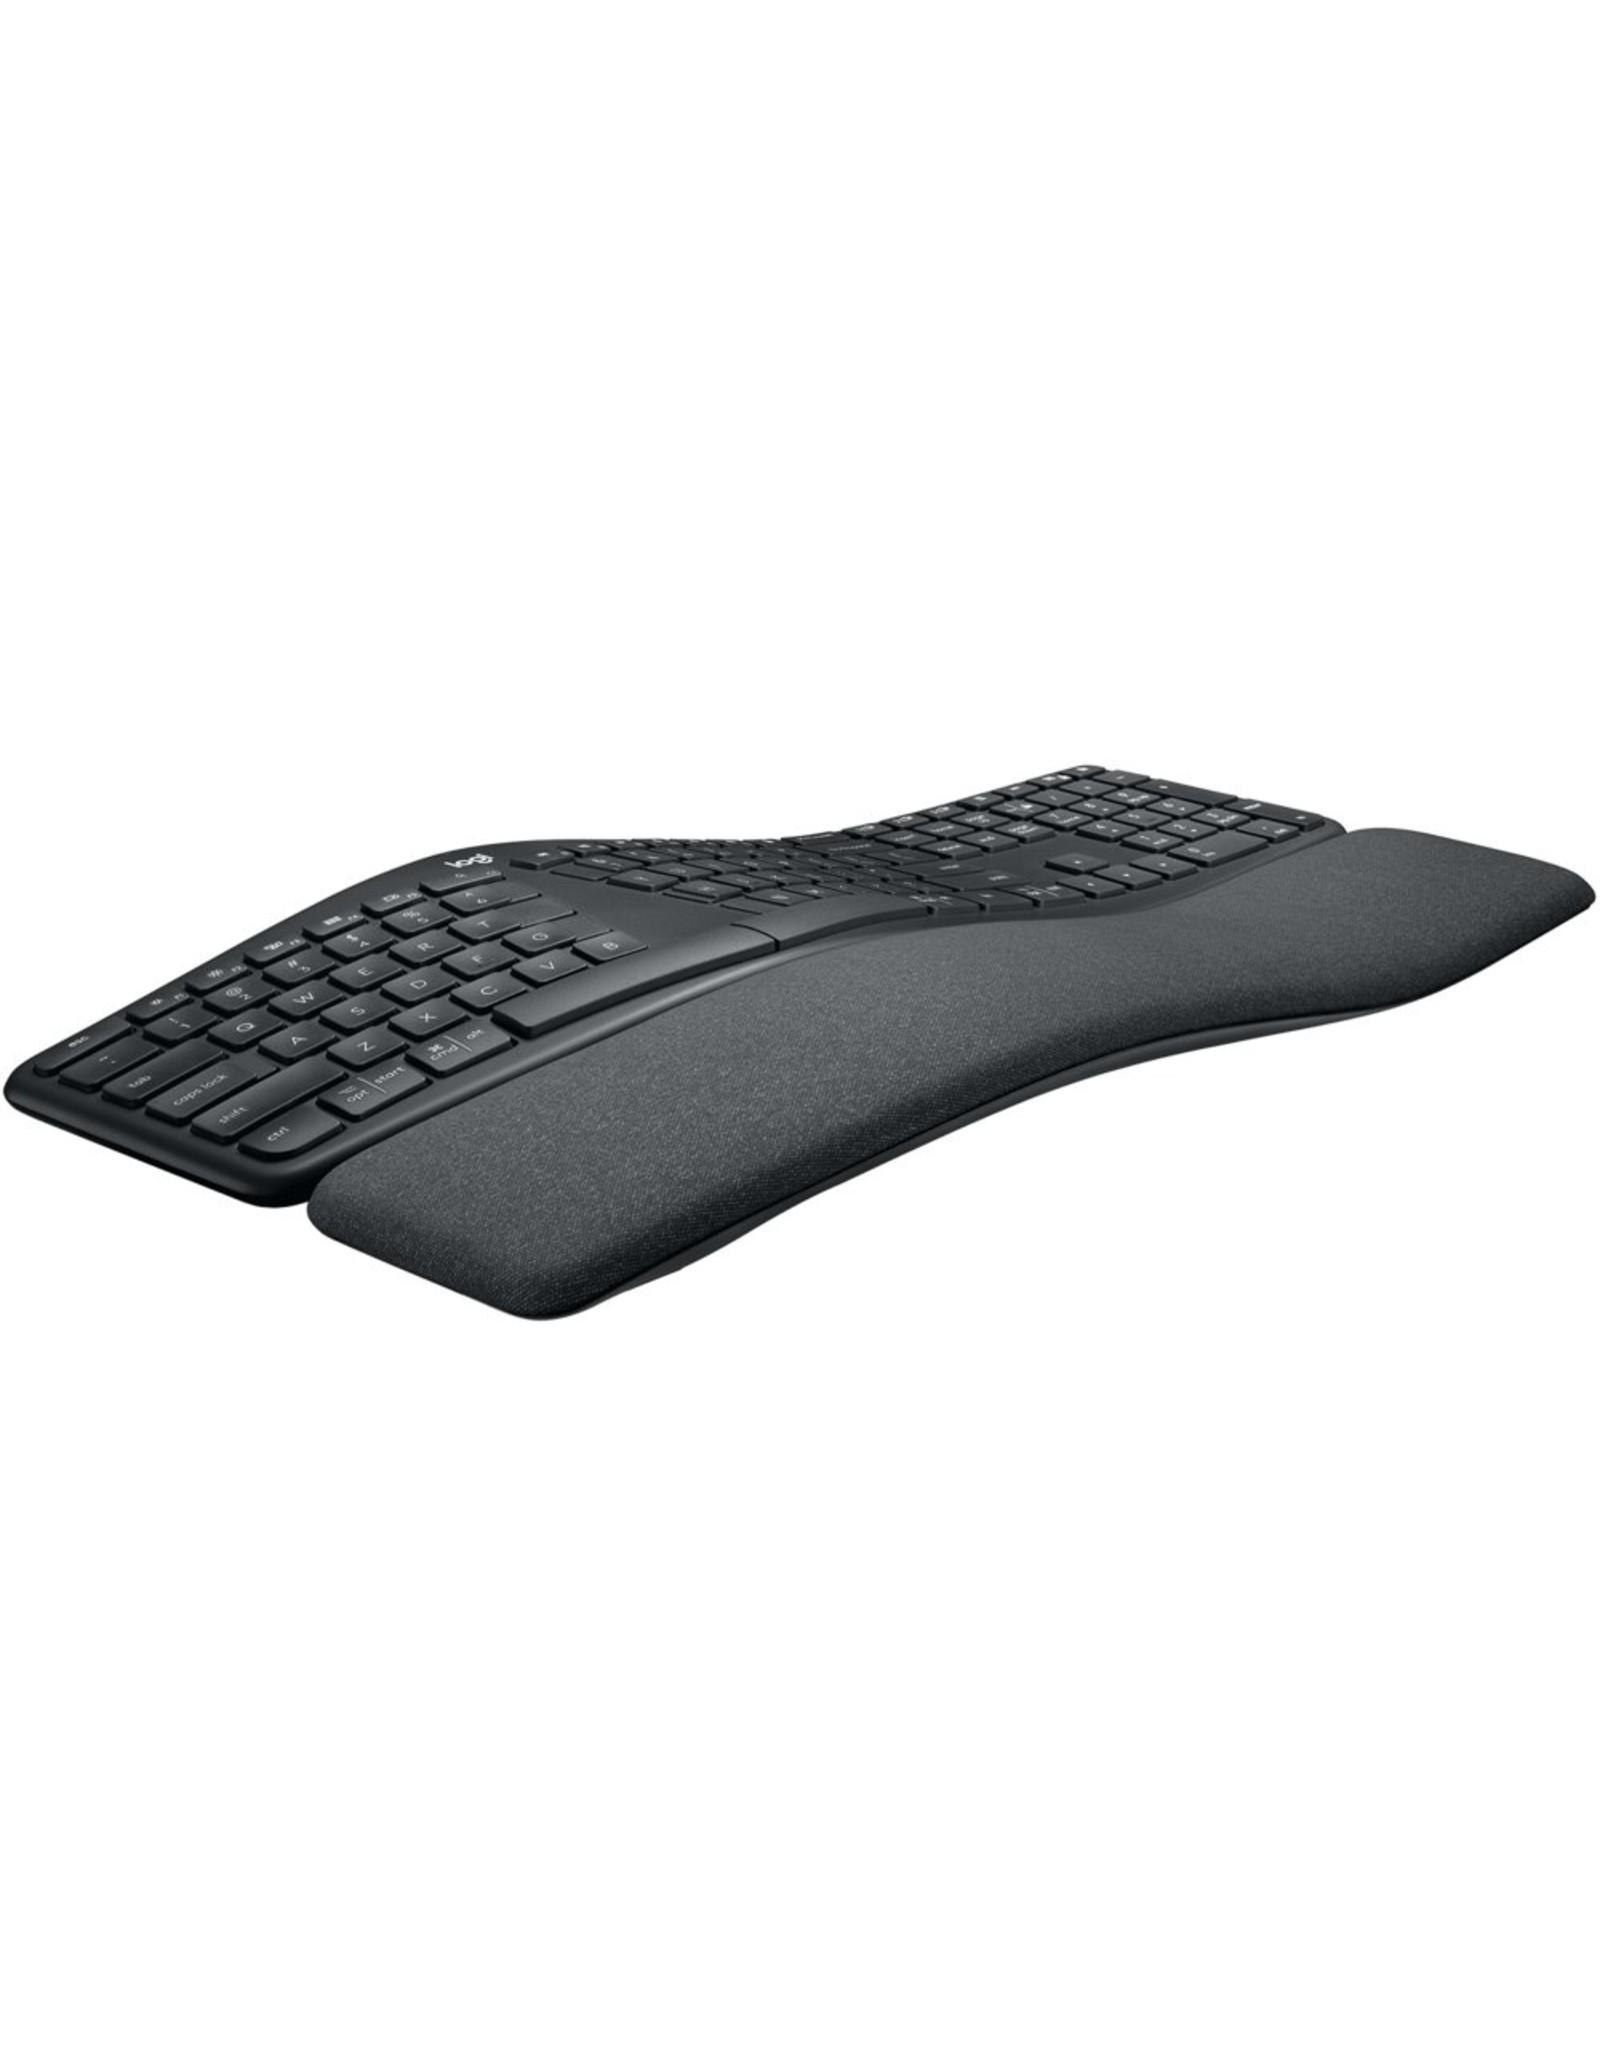 Logitech Ergo K860 toetsenbord RF-draadloos + Bluetooth US I